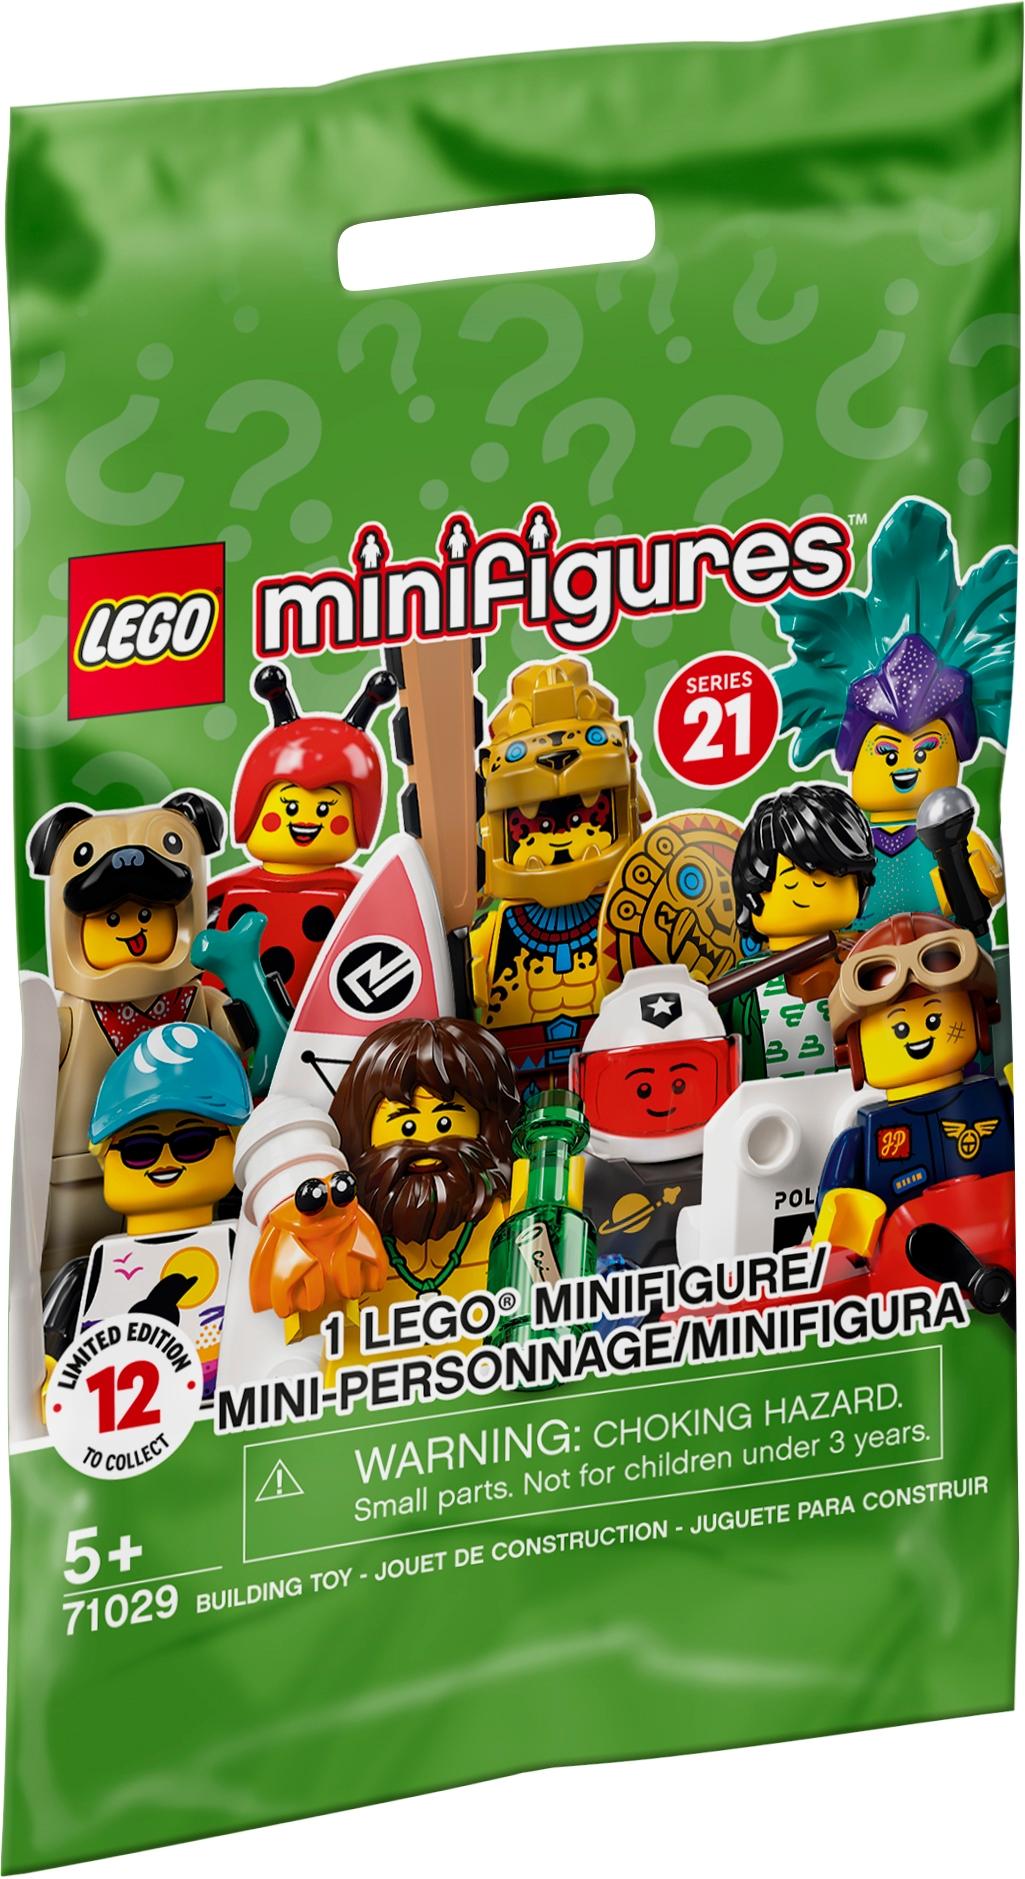 LEGO® Collectible Minifigures Minifigs col21-4 Marienkäfer-Mädchen 7102